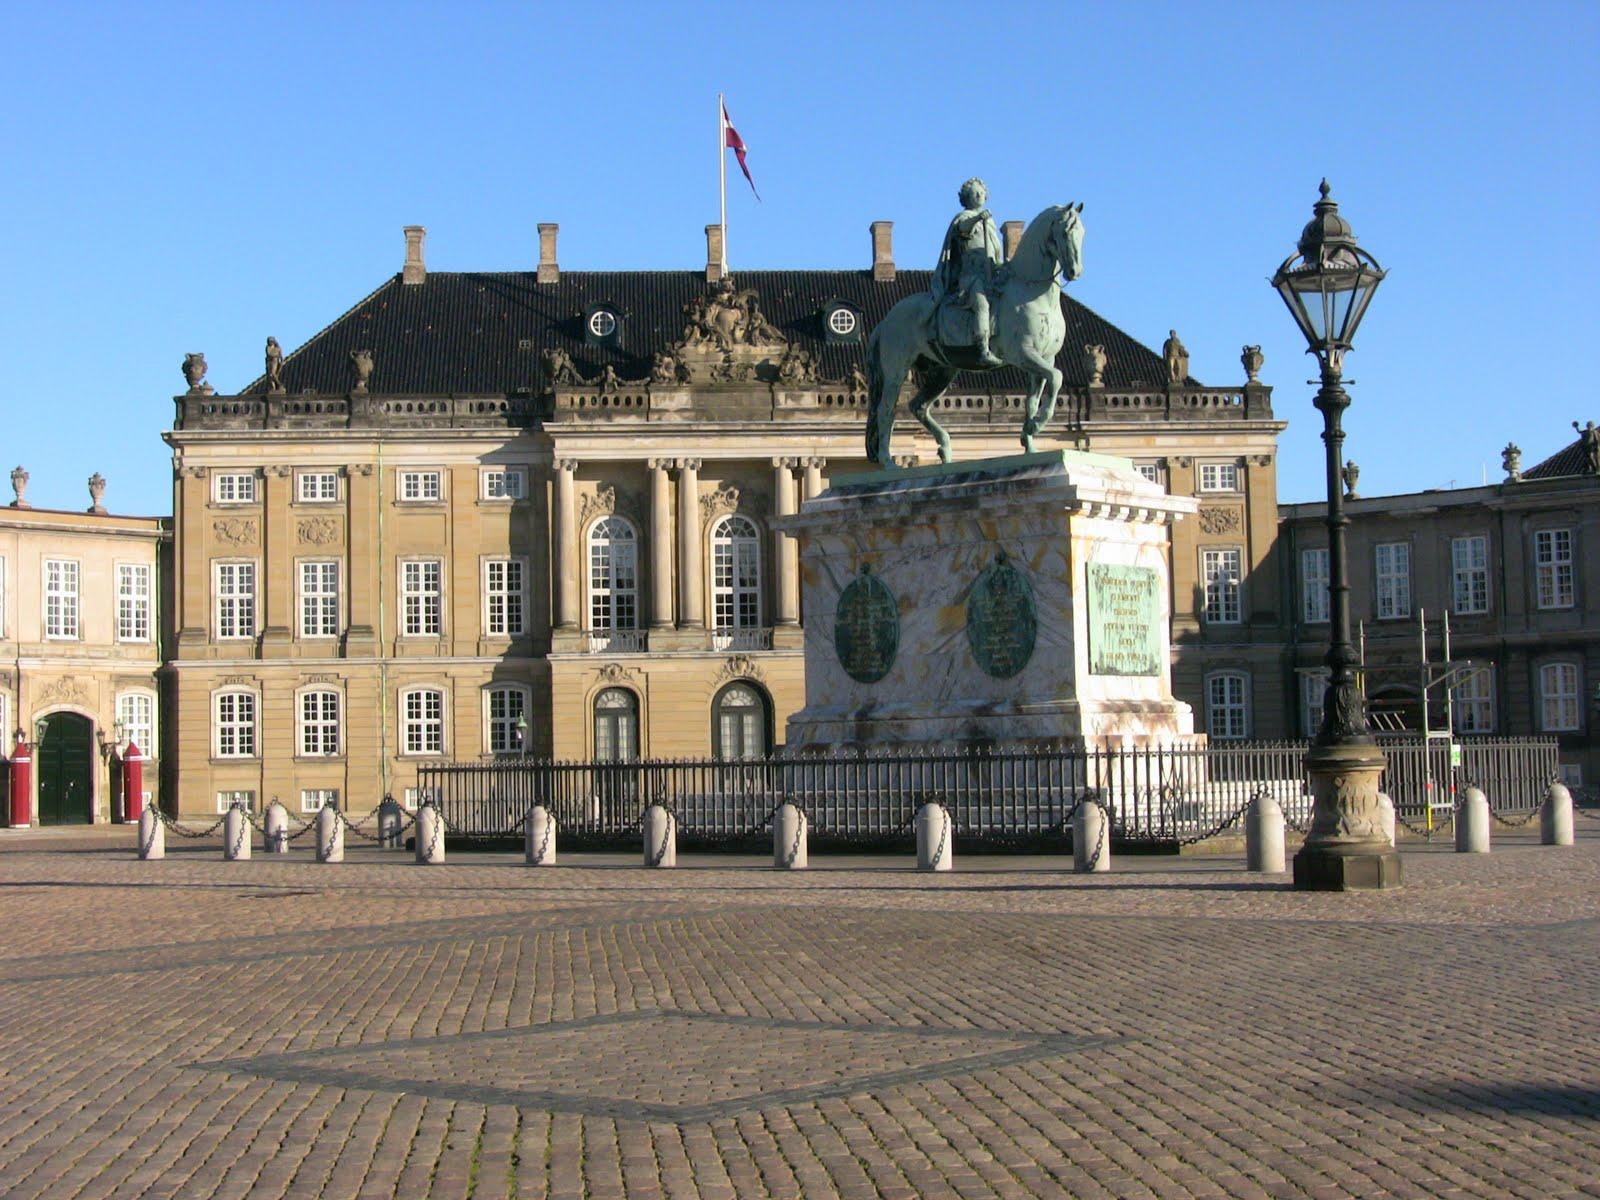 Castelul Amalienborg, reşedinţa Reginei Danemarcei